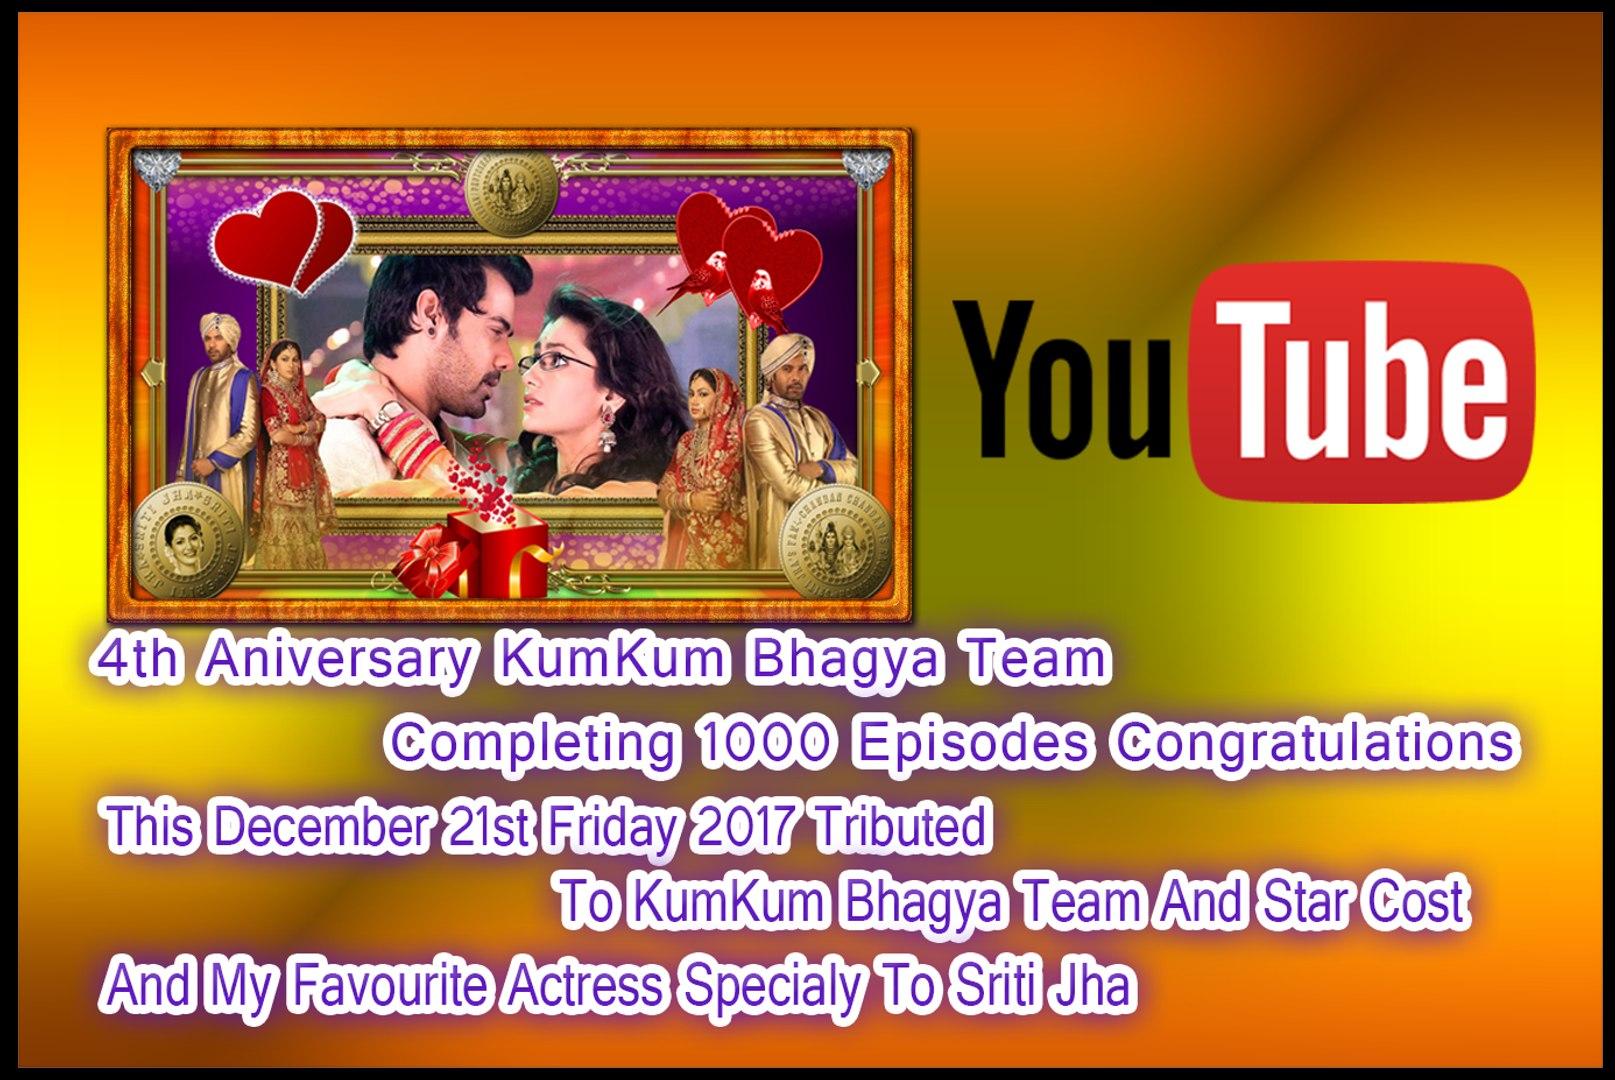 Kumkum Bhagya   1000 Episode   Complete   2017   Tributed To Sriti Jha    From Photoshop Chandan